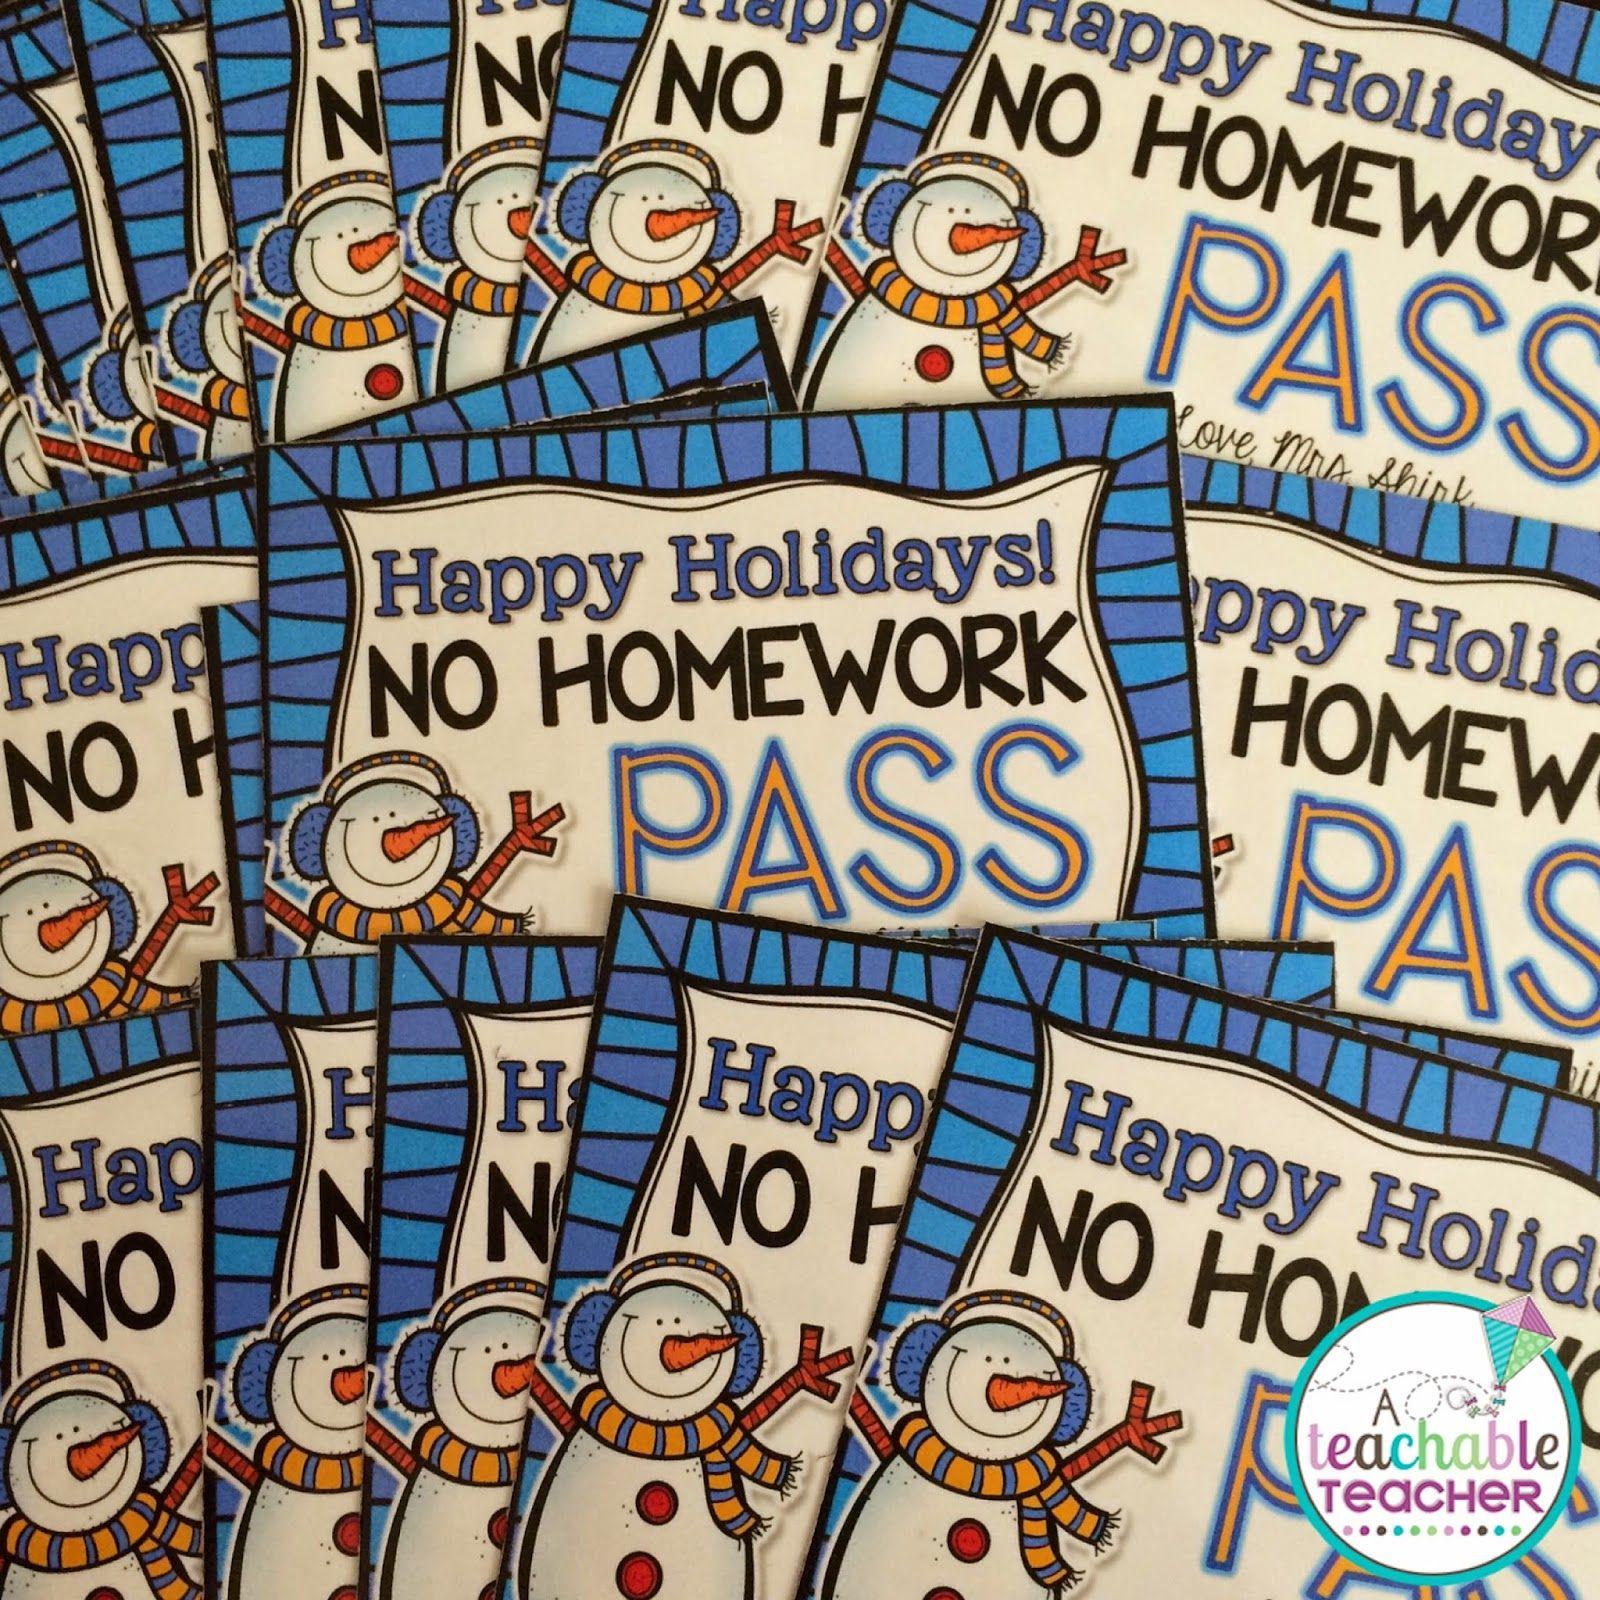 Happy holidays homework pass entry level engineer resume objective